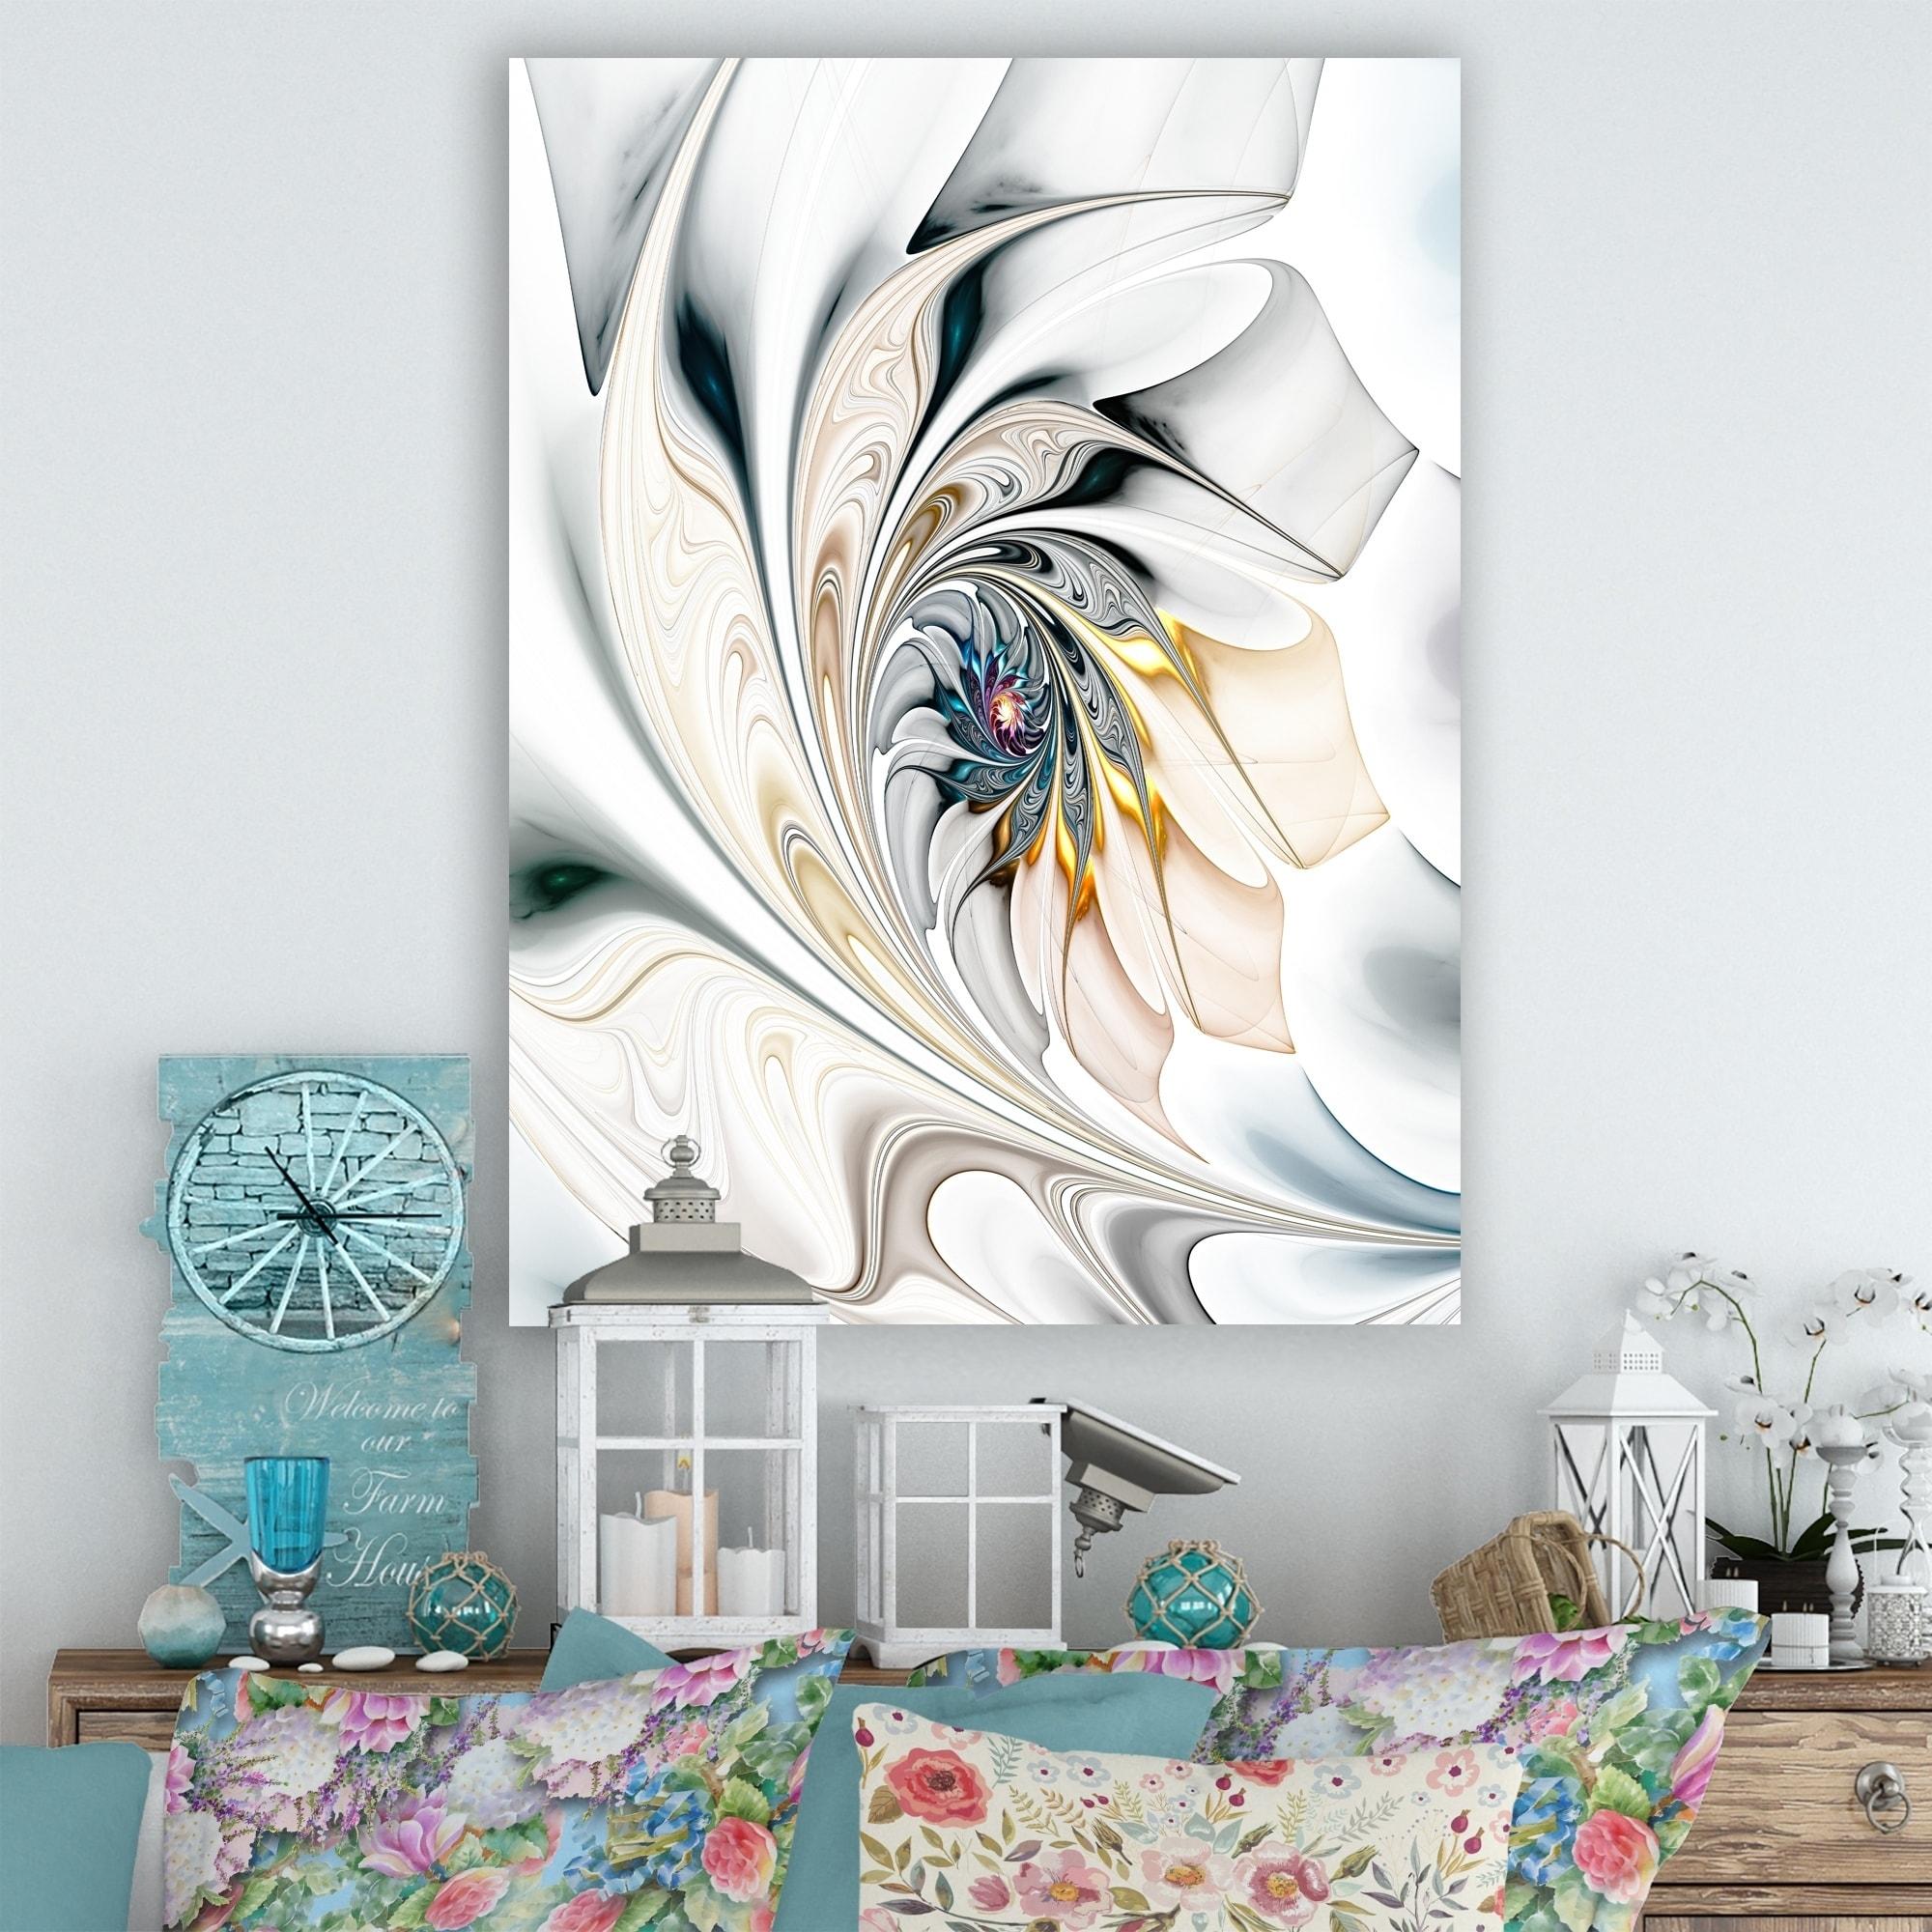 Art gallery shop our best home goods deals online at overstock com